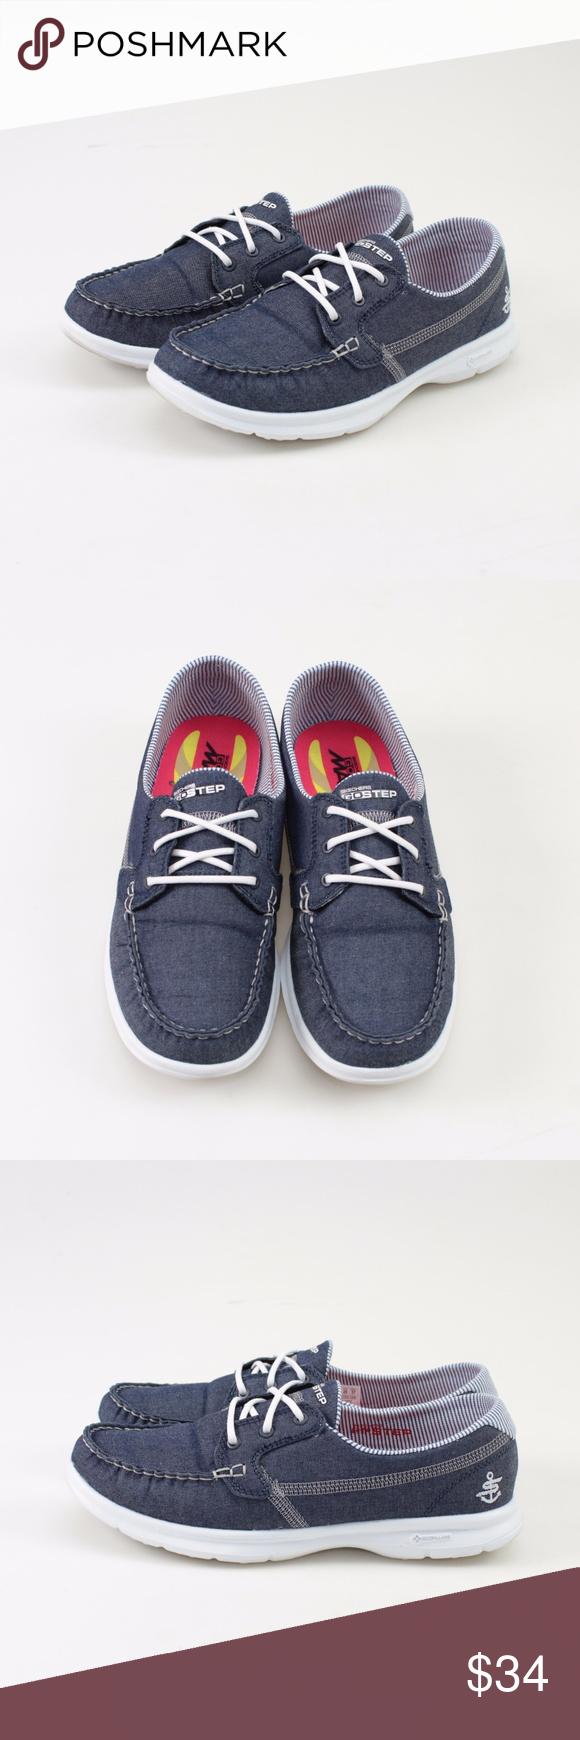 Skechers GO STEP Boat Shoes // Indigo